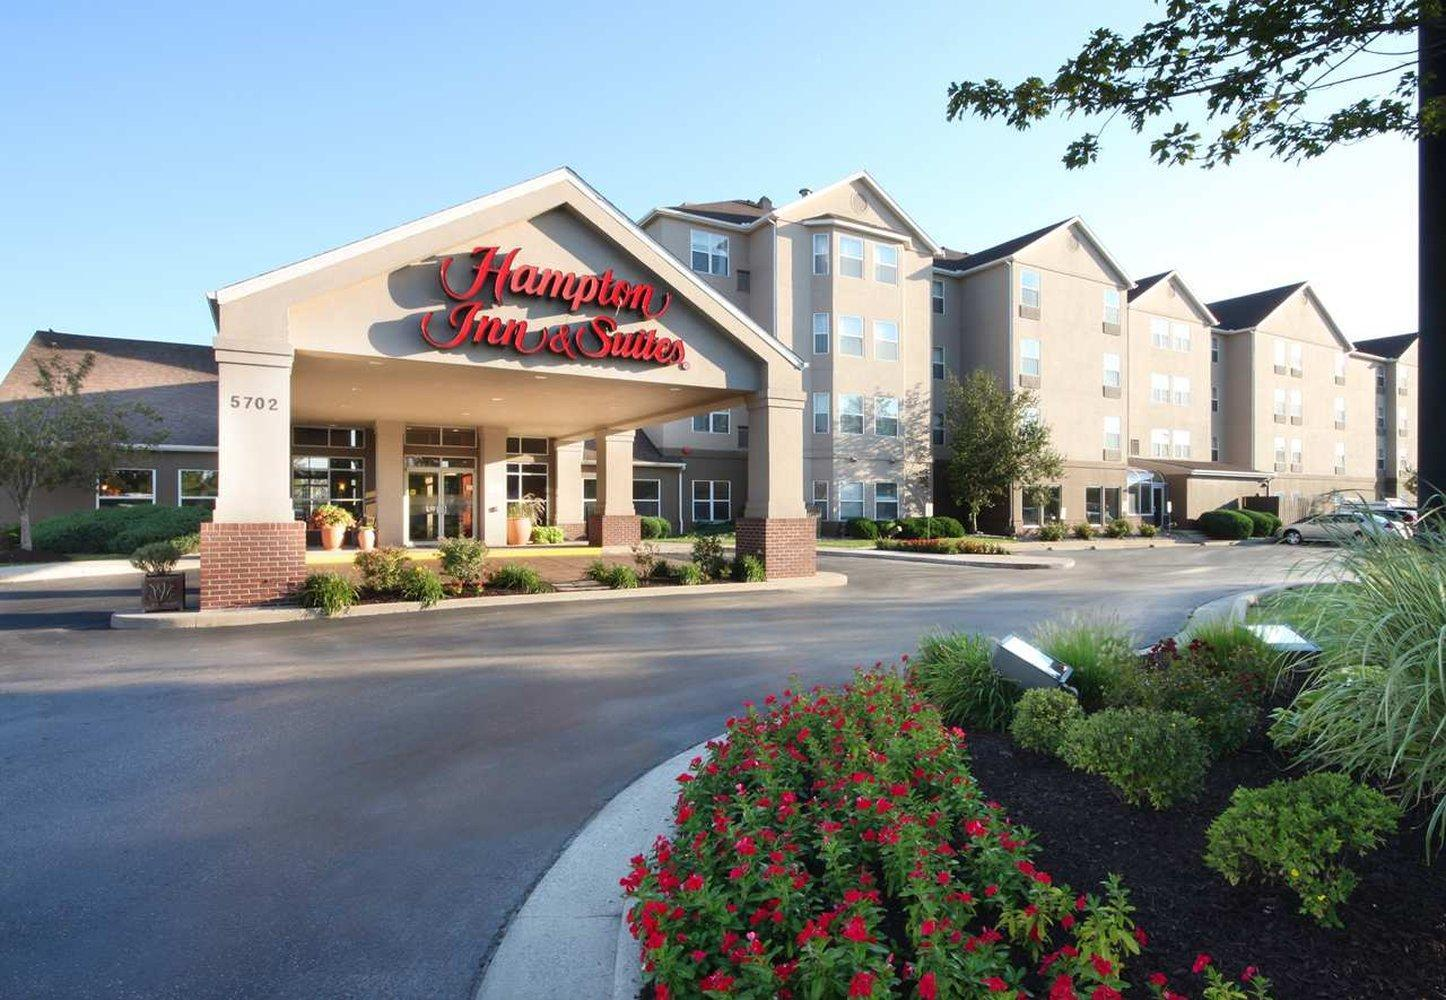 Hampton Inn And Suites Ft. Wayne North Hotel